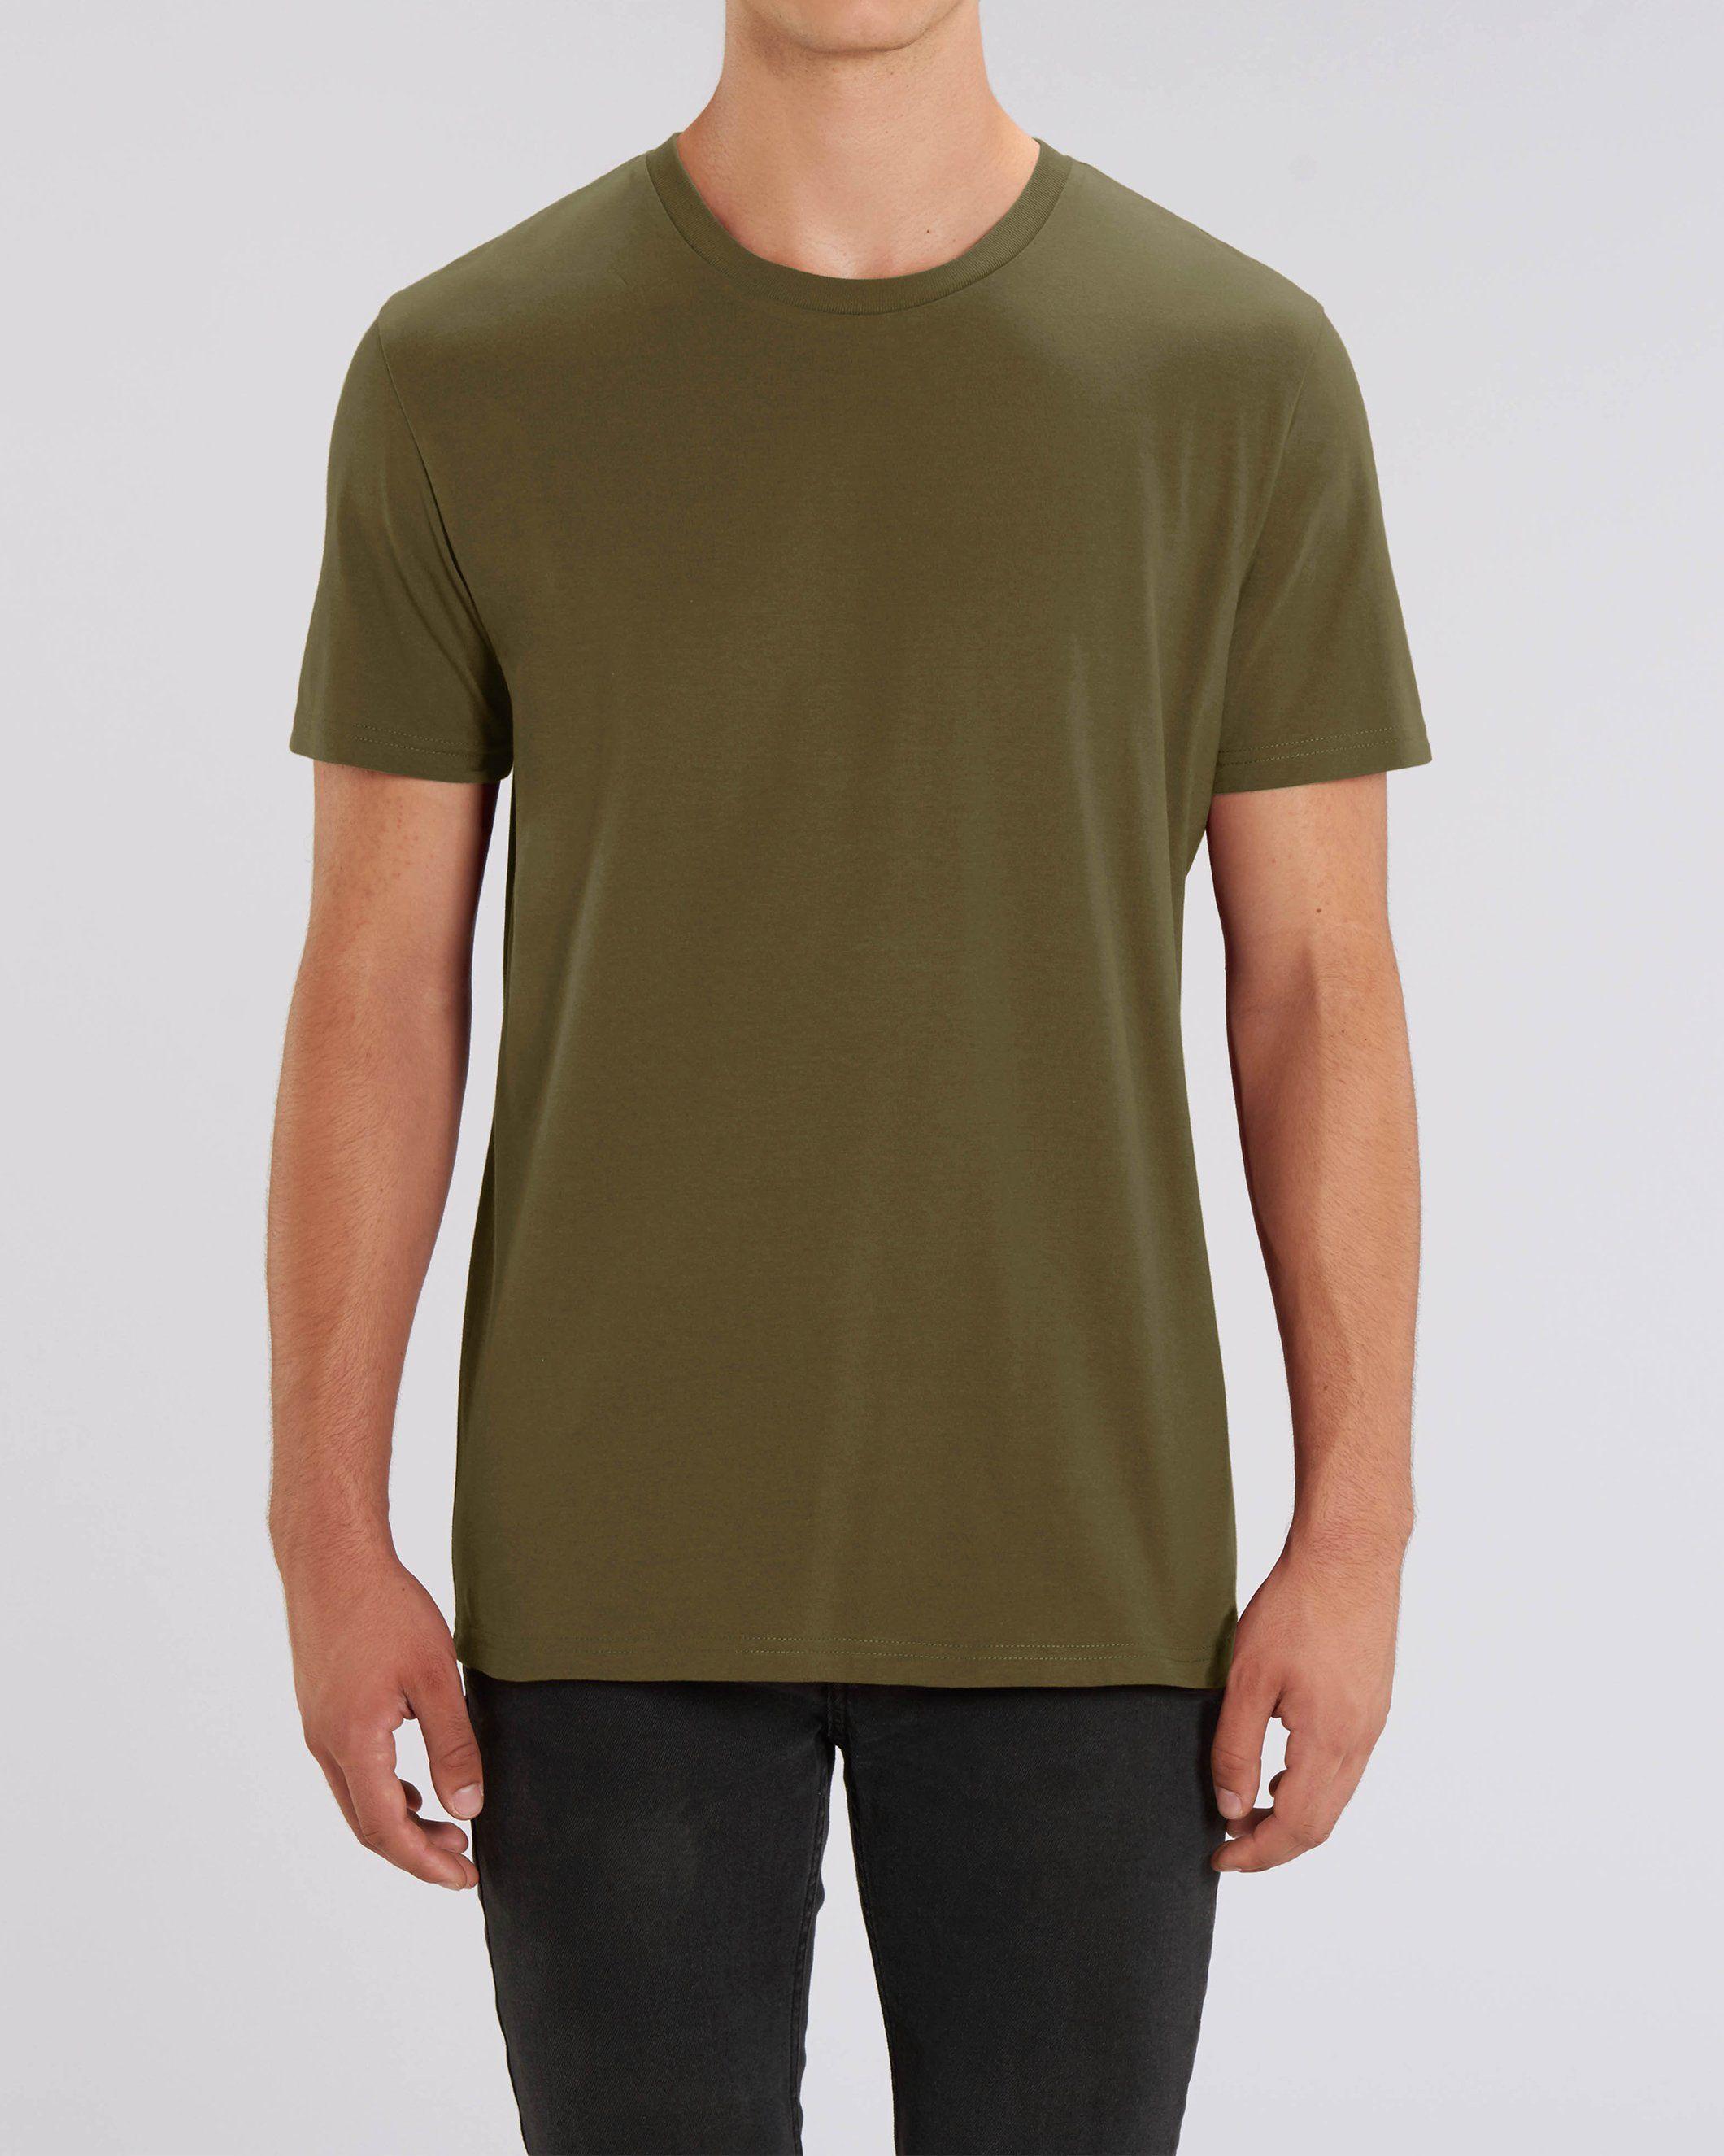 Nauli Unisex Regular Fit T-Shirt in Khaki